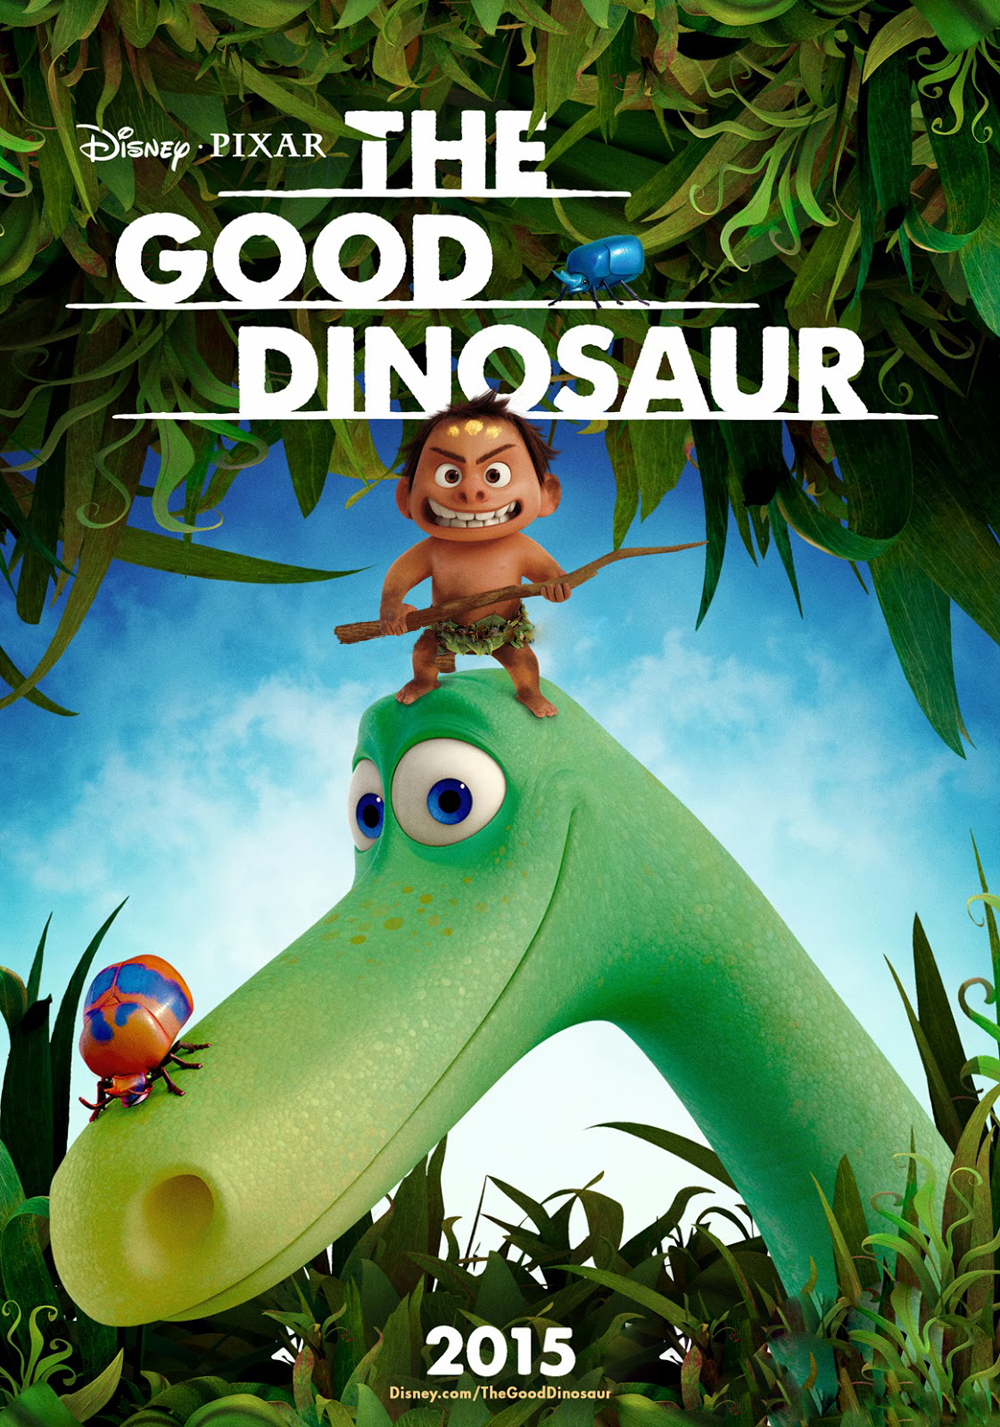 The Good Dinosaur Poster 2015